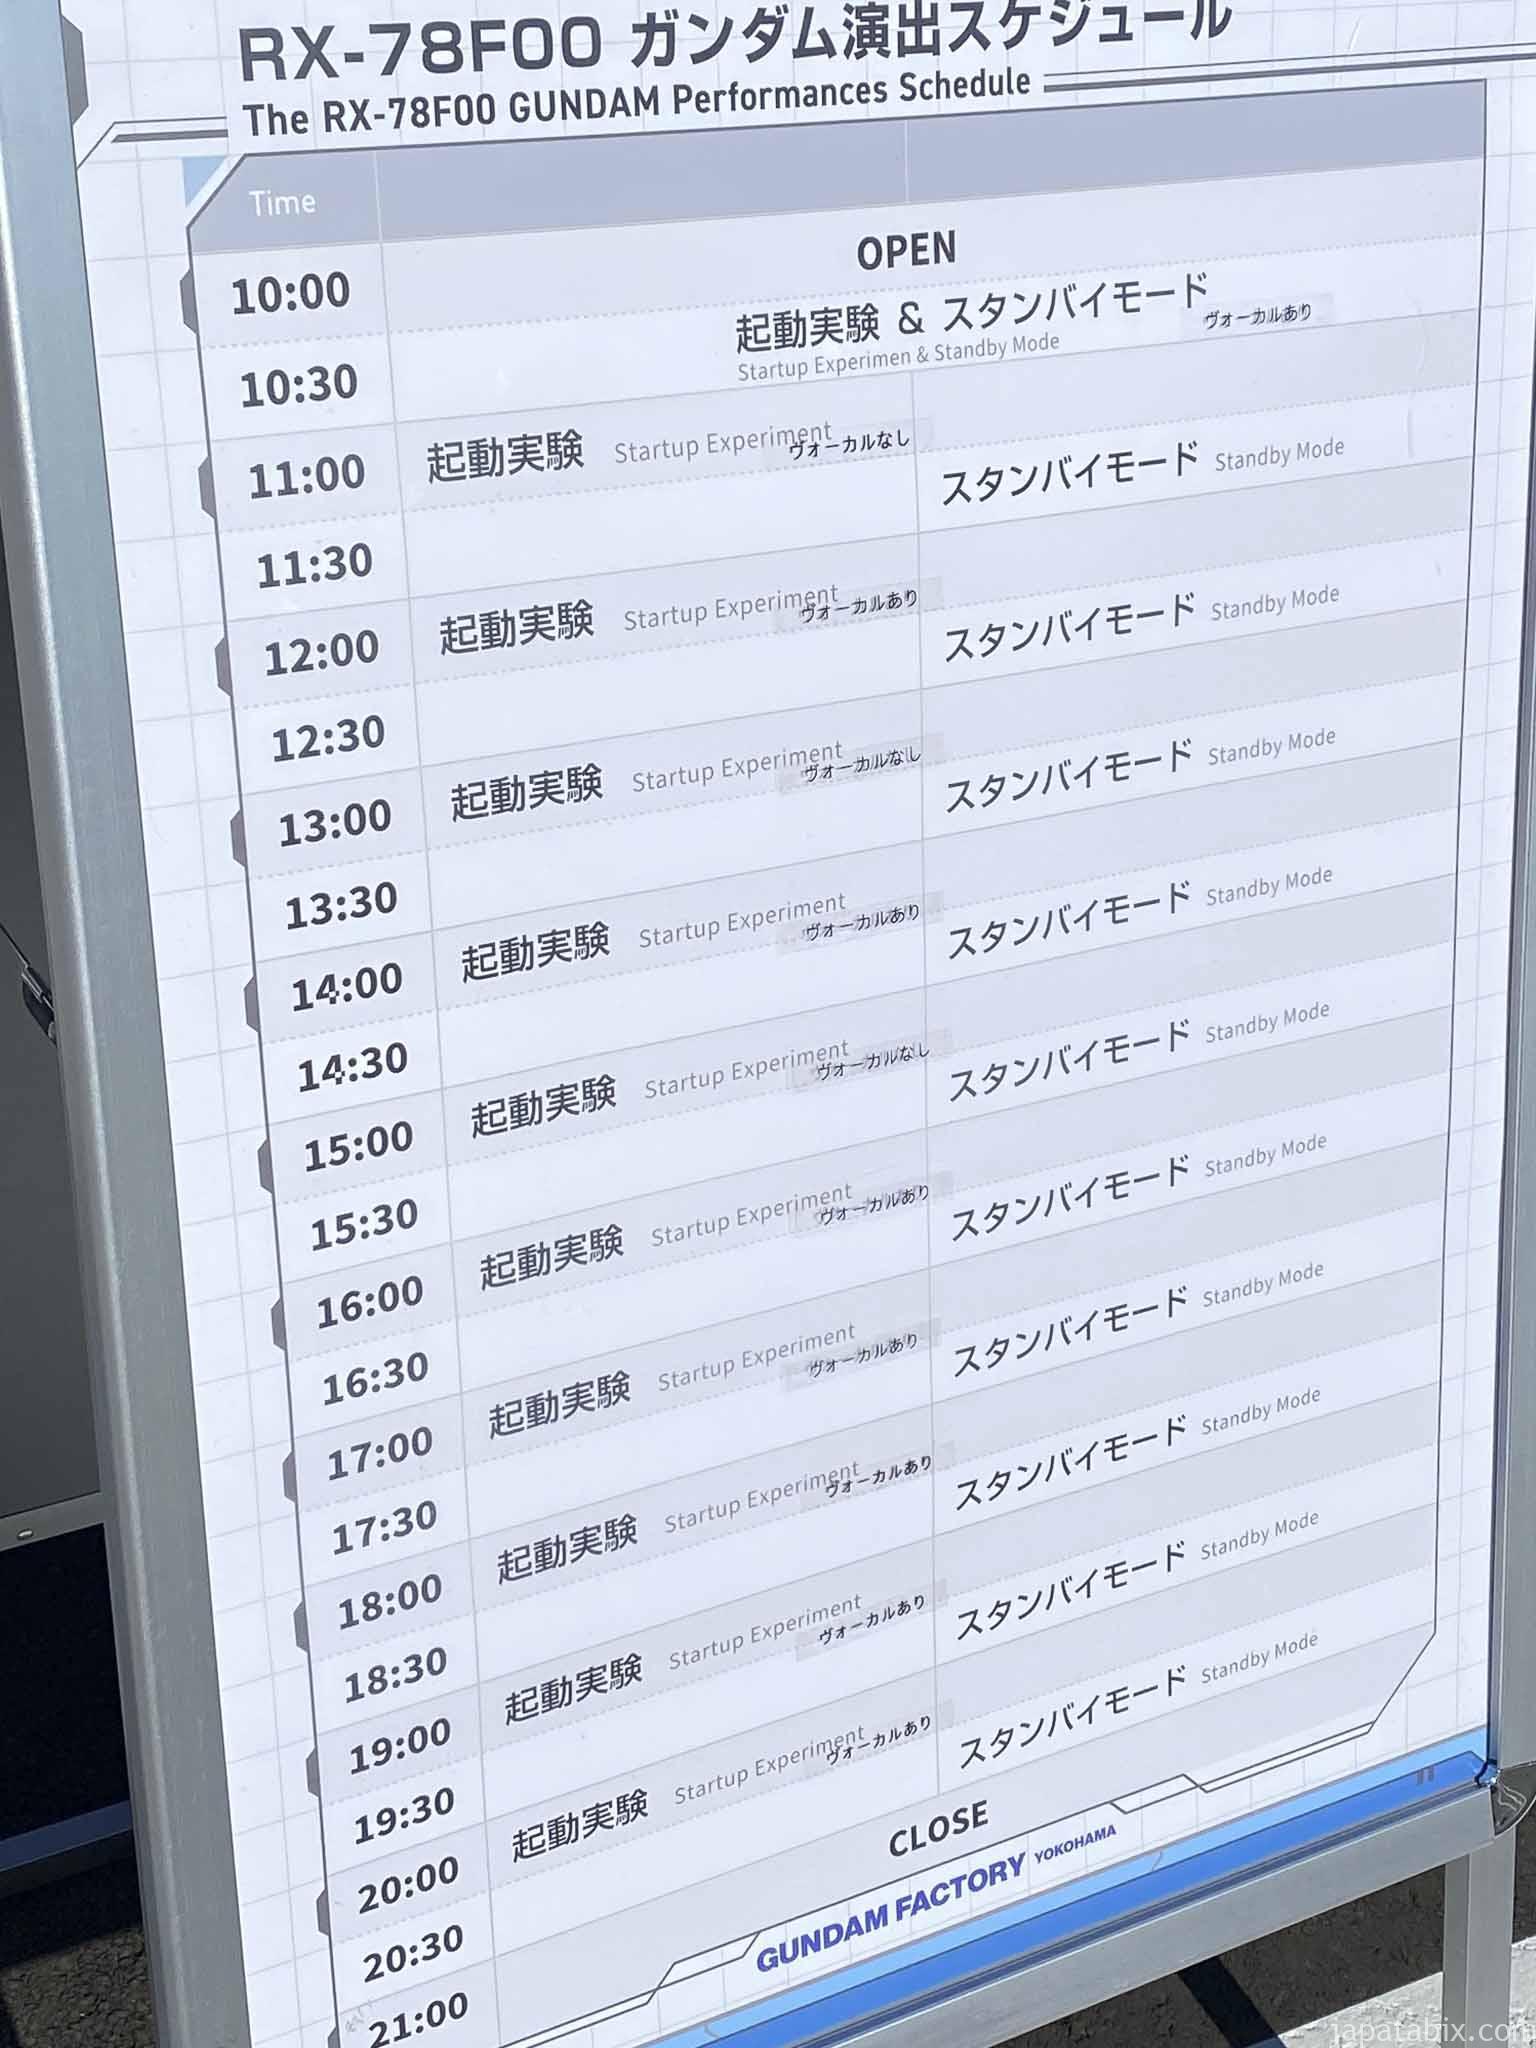 RX-78F00 ガンダム演出スケジュール